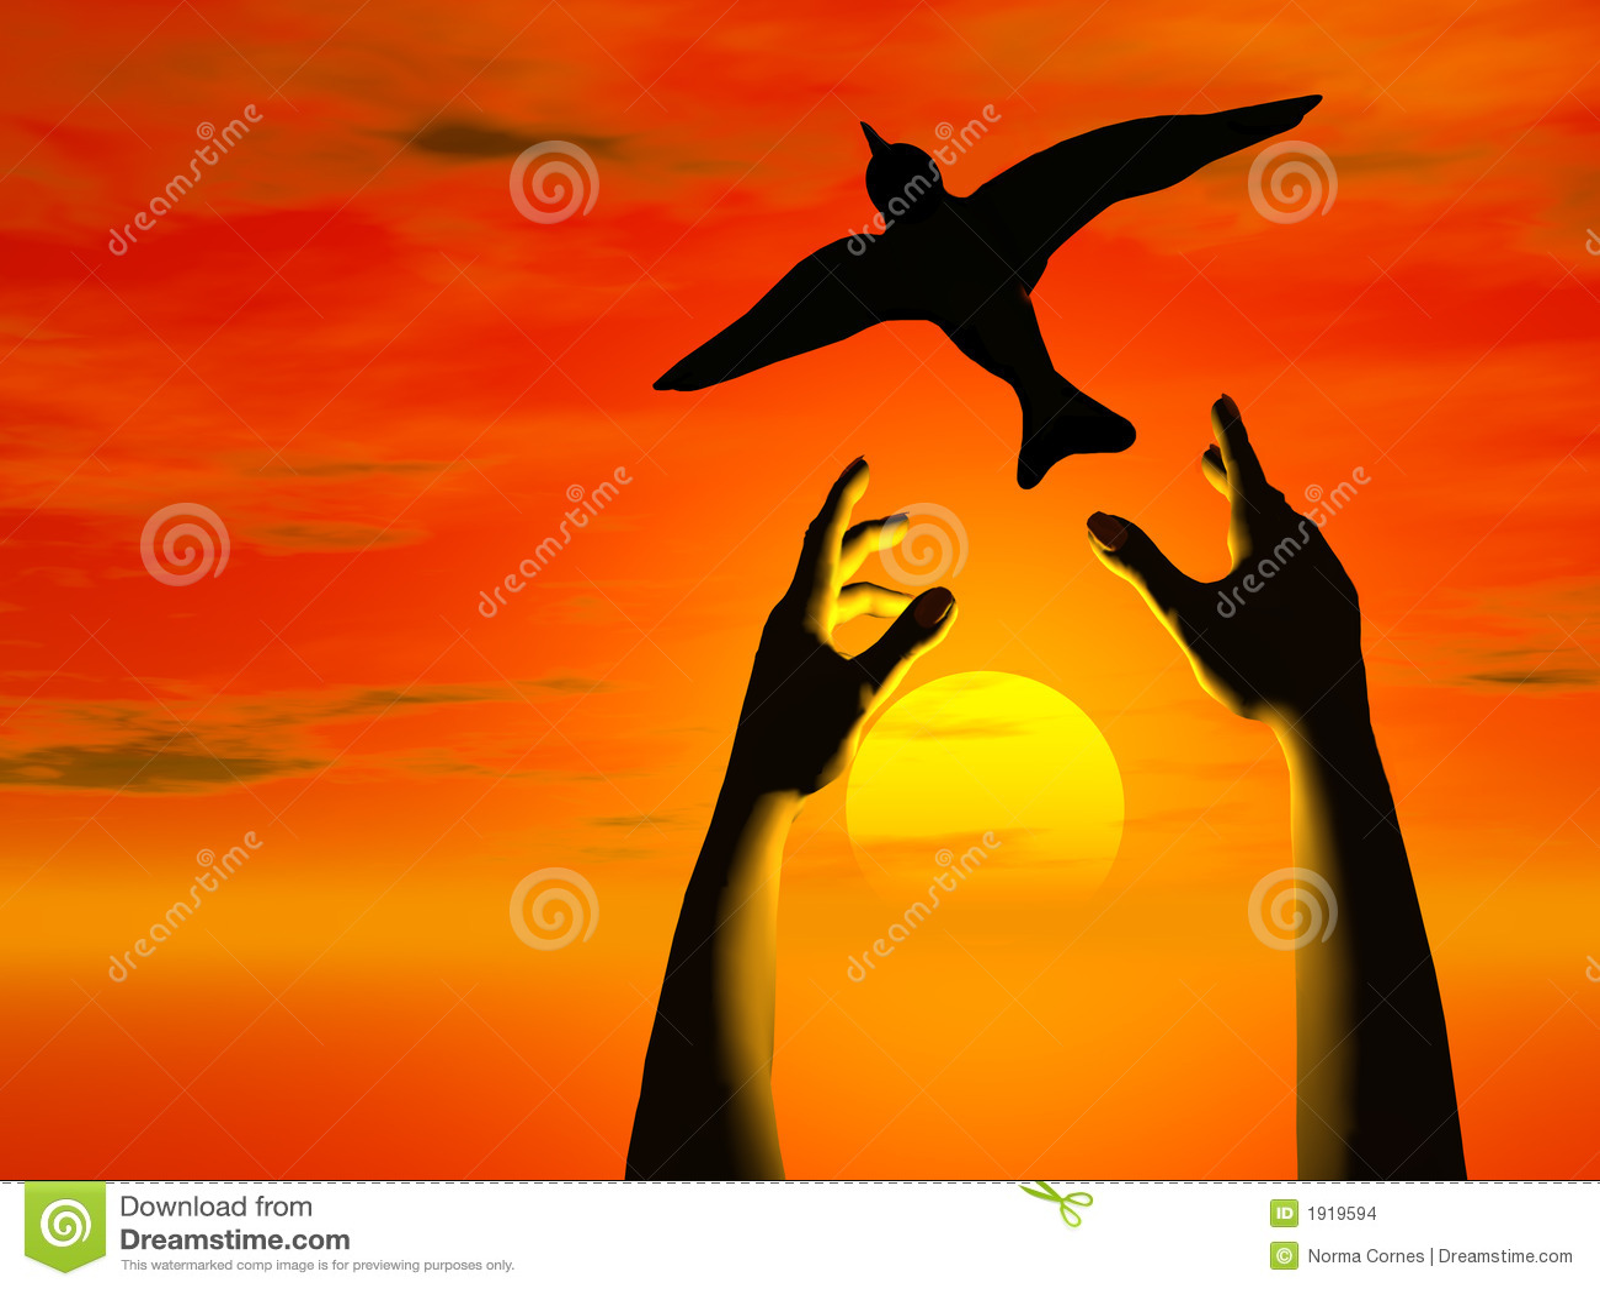 hands free bird into sunset stock illustration illustration of